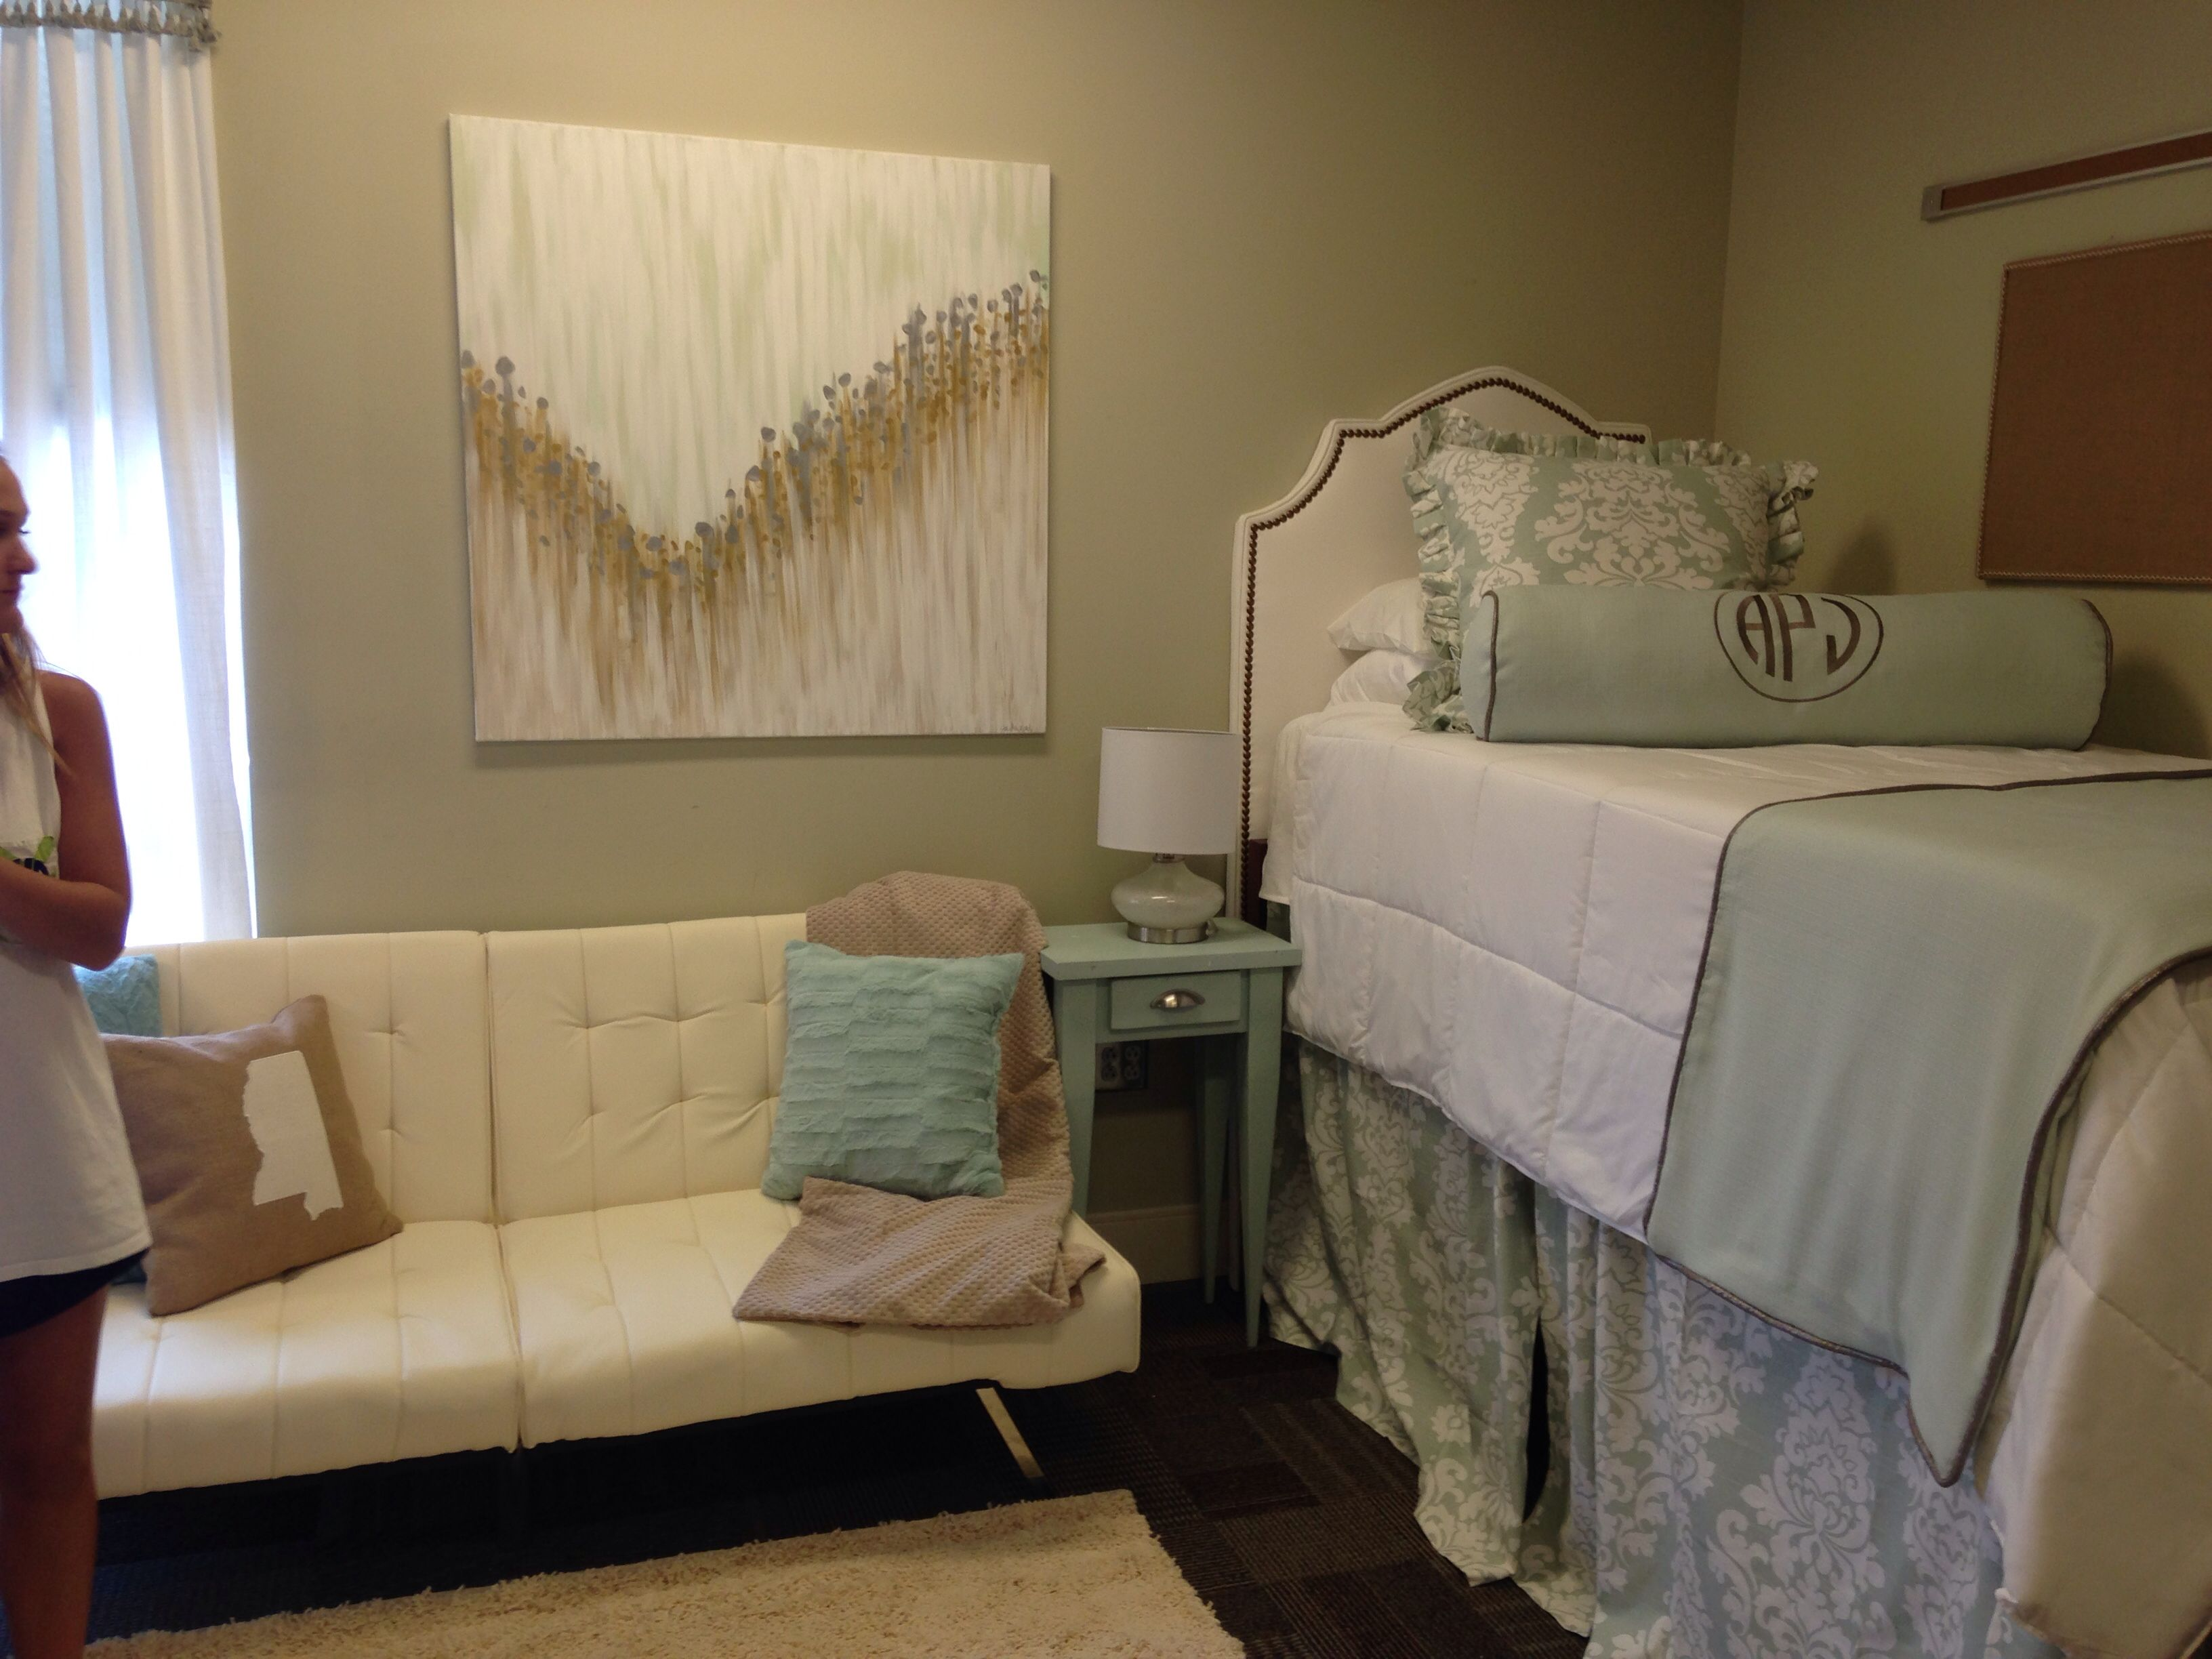 Mississippi State University Dorm Room Premier Fabrics Jackson